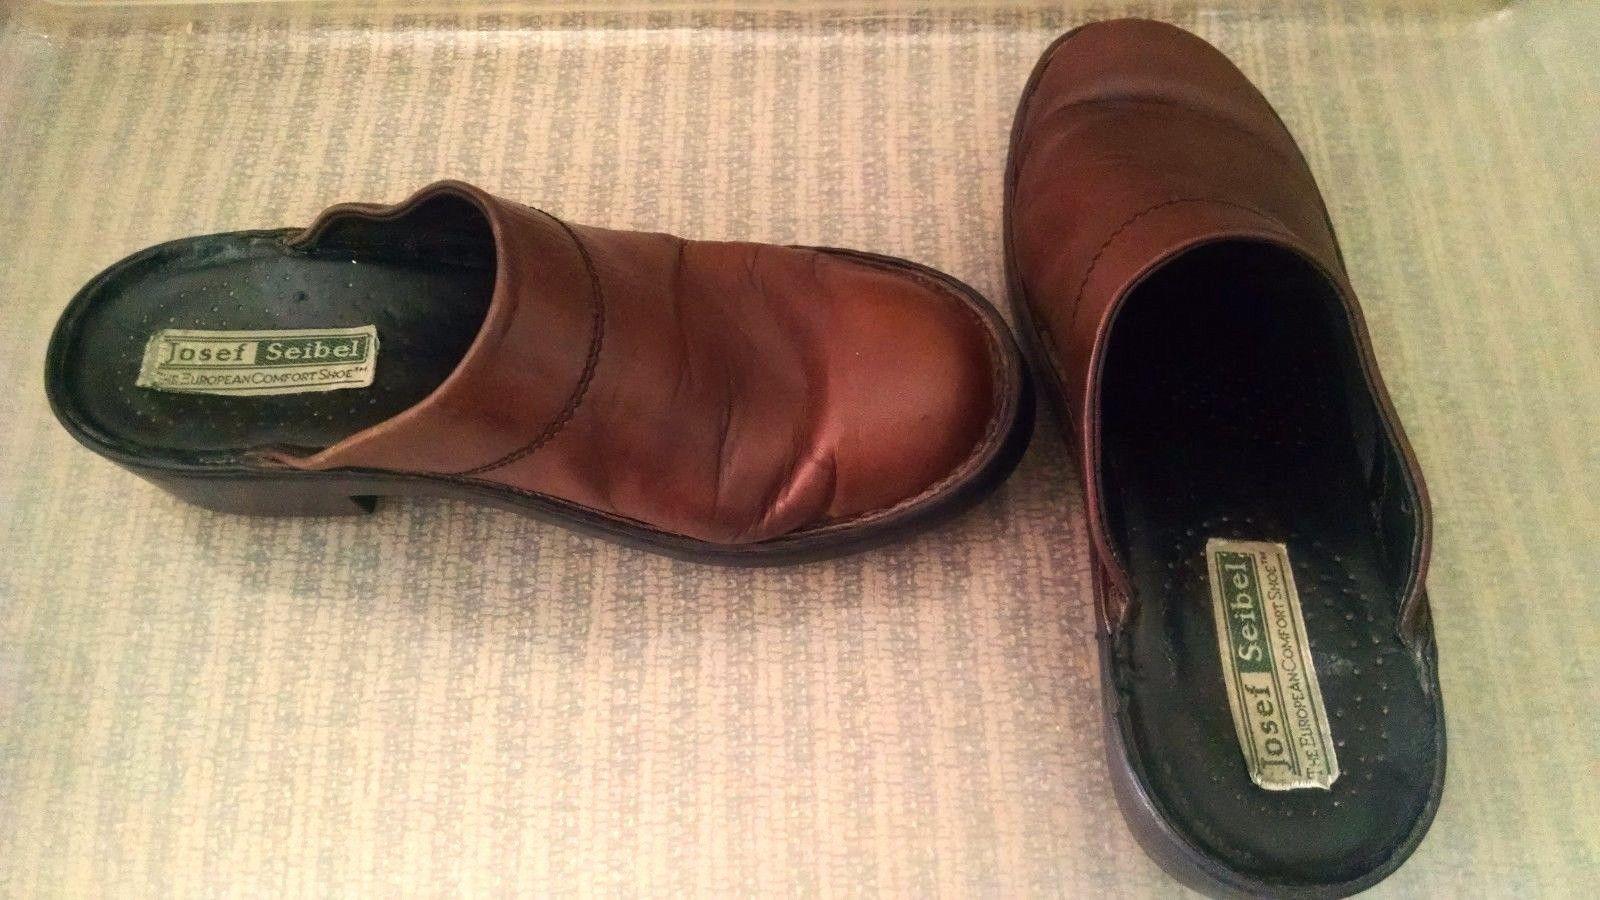 Josef Seibel Womens Clogs 38 EU 7 - 7.5 US Mules Slip On European Comfort Shoe